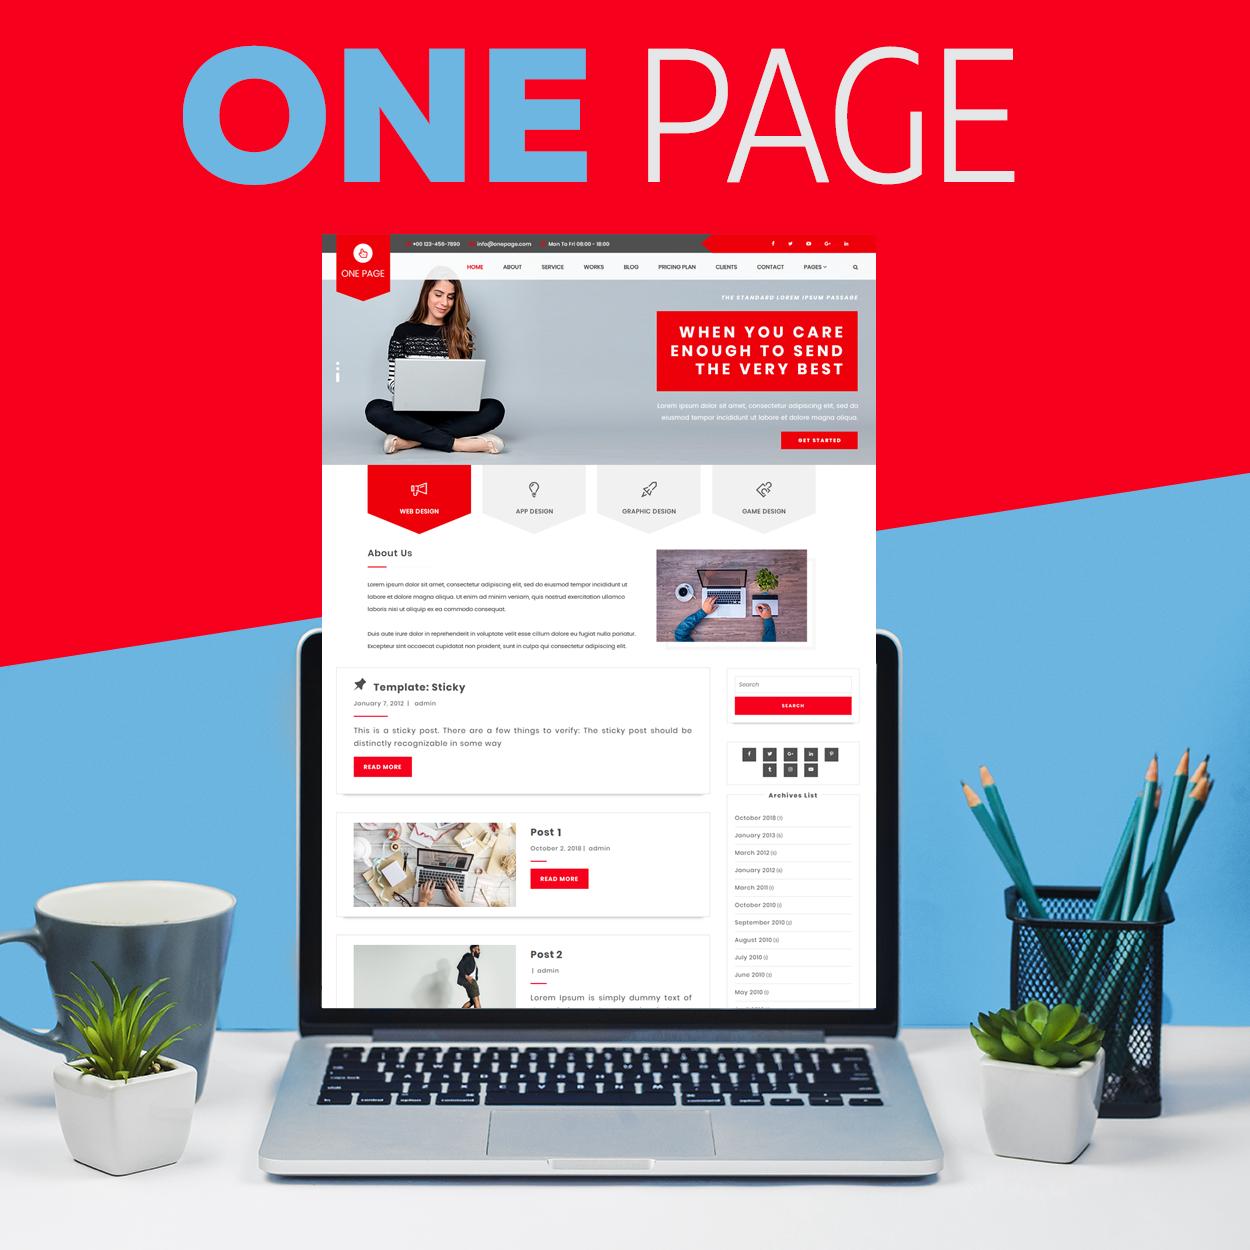 Изработка на One page уеб сайт, https://webnime.com/